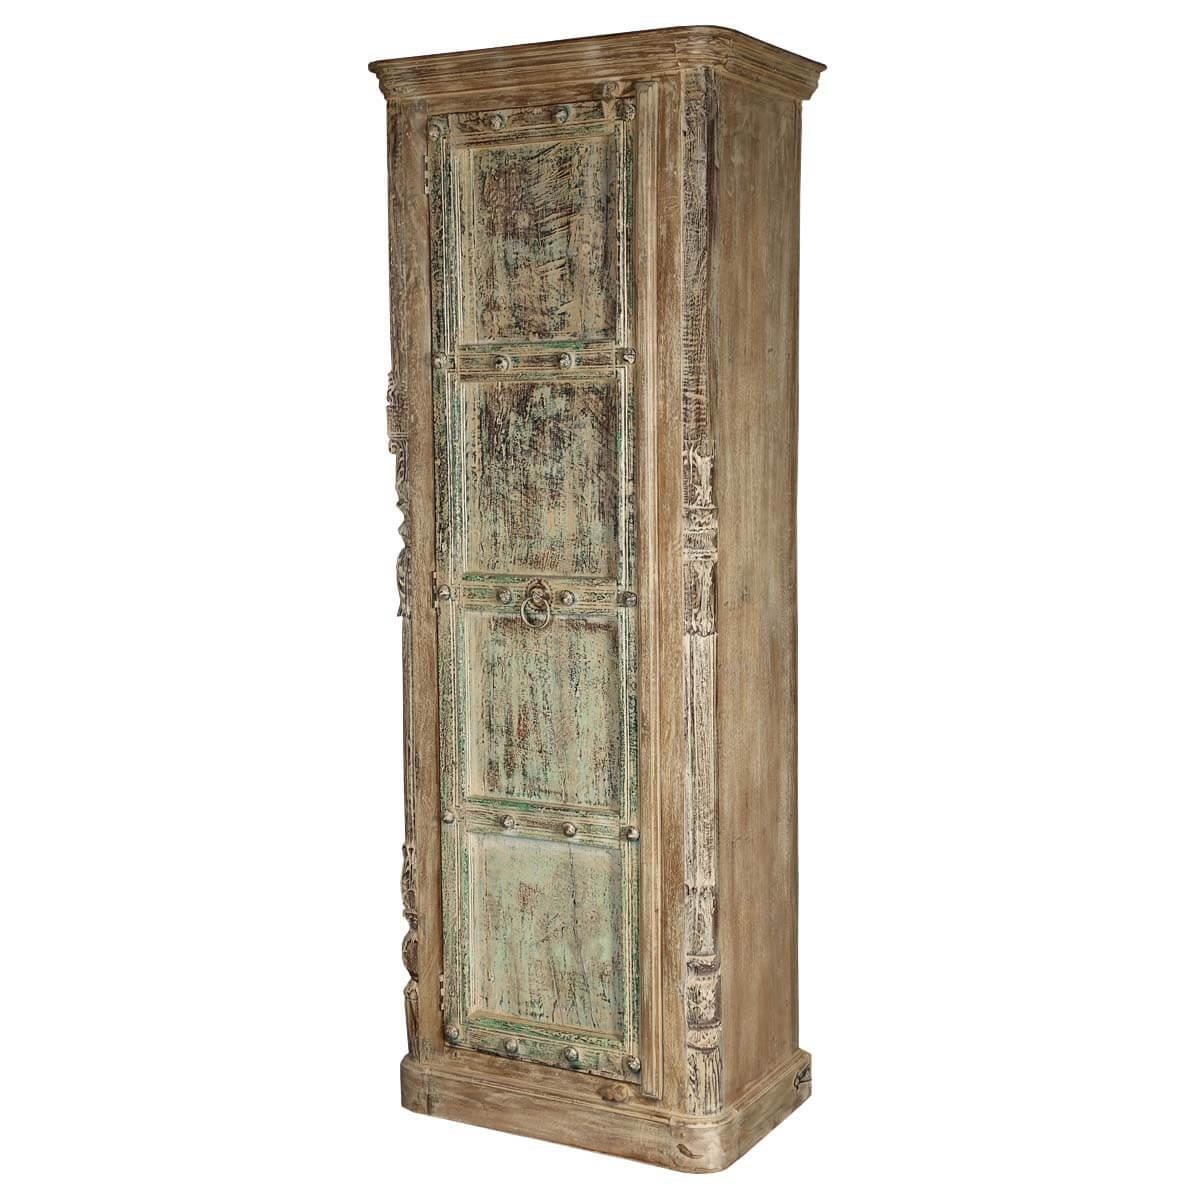 Urbana Distressed Rustic Reclaimed Wood Single Door Armoire Cabinet